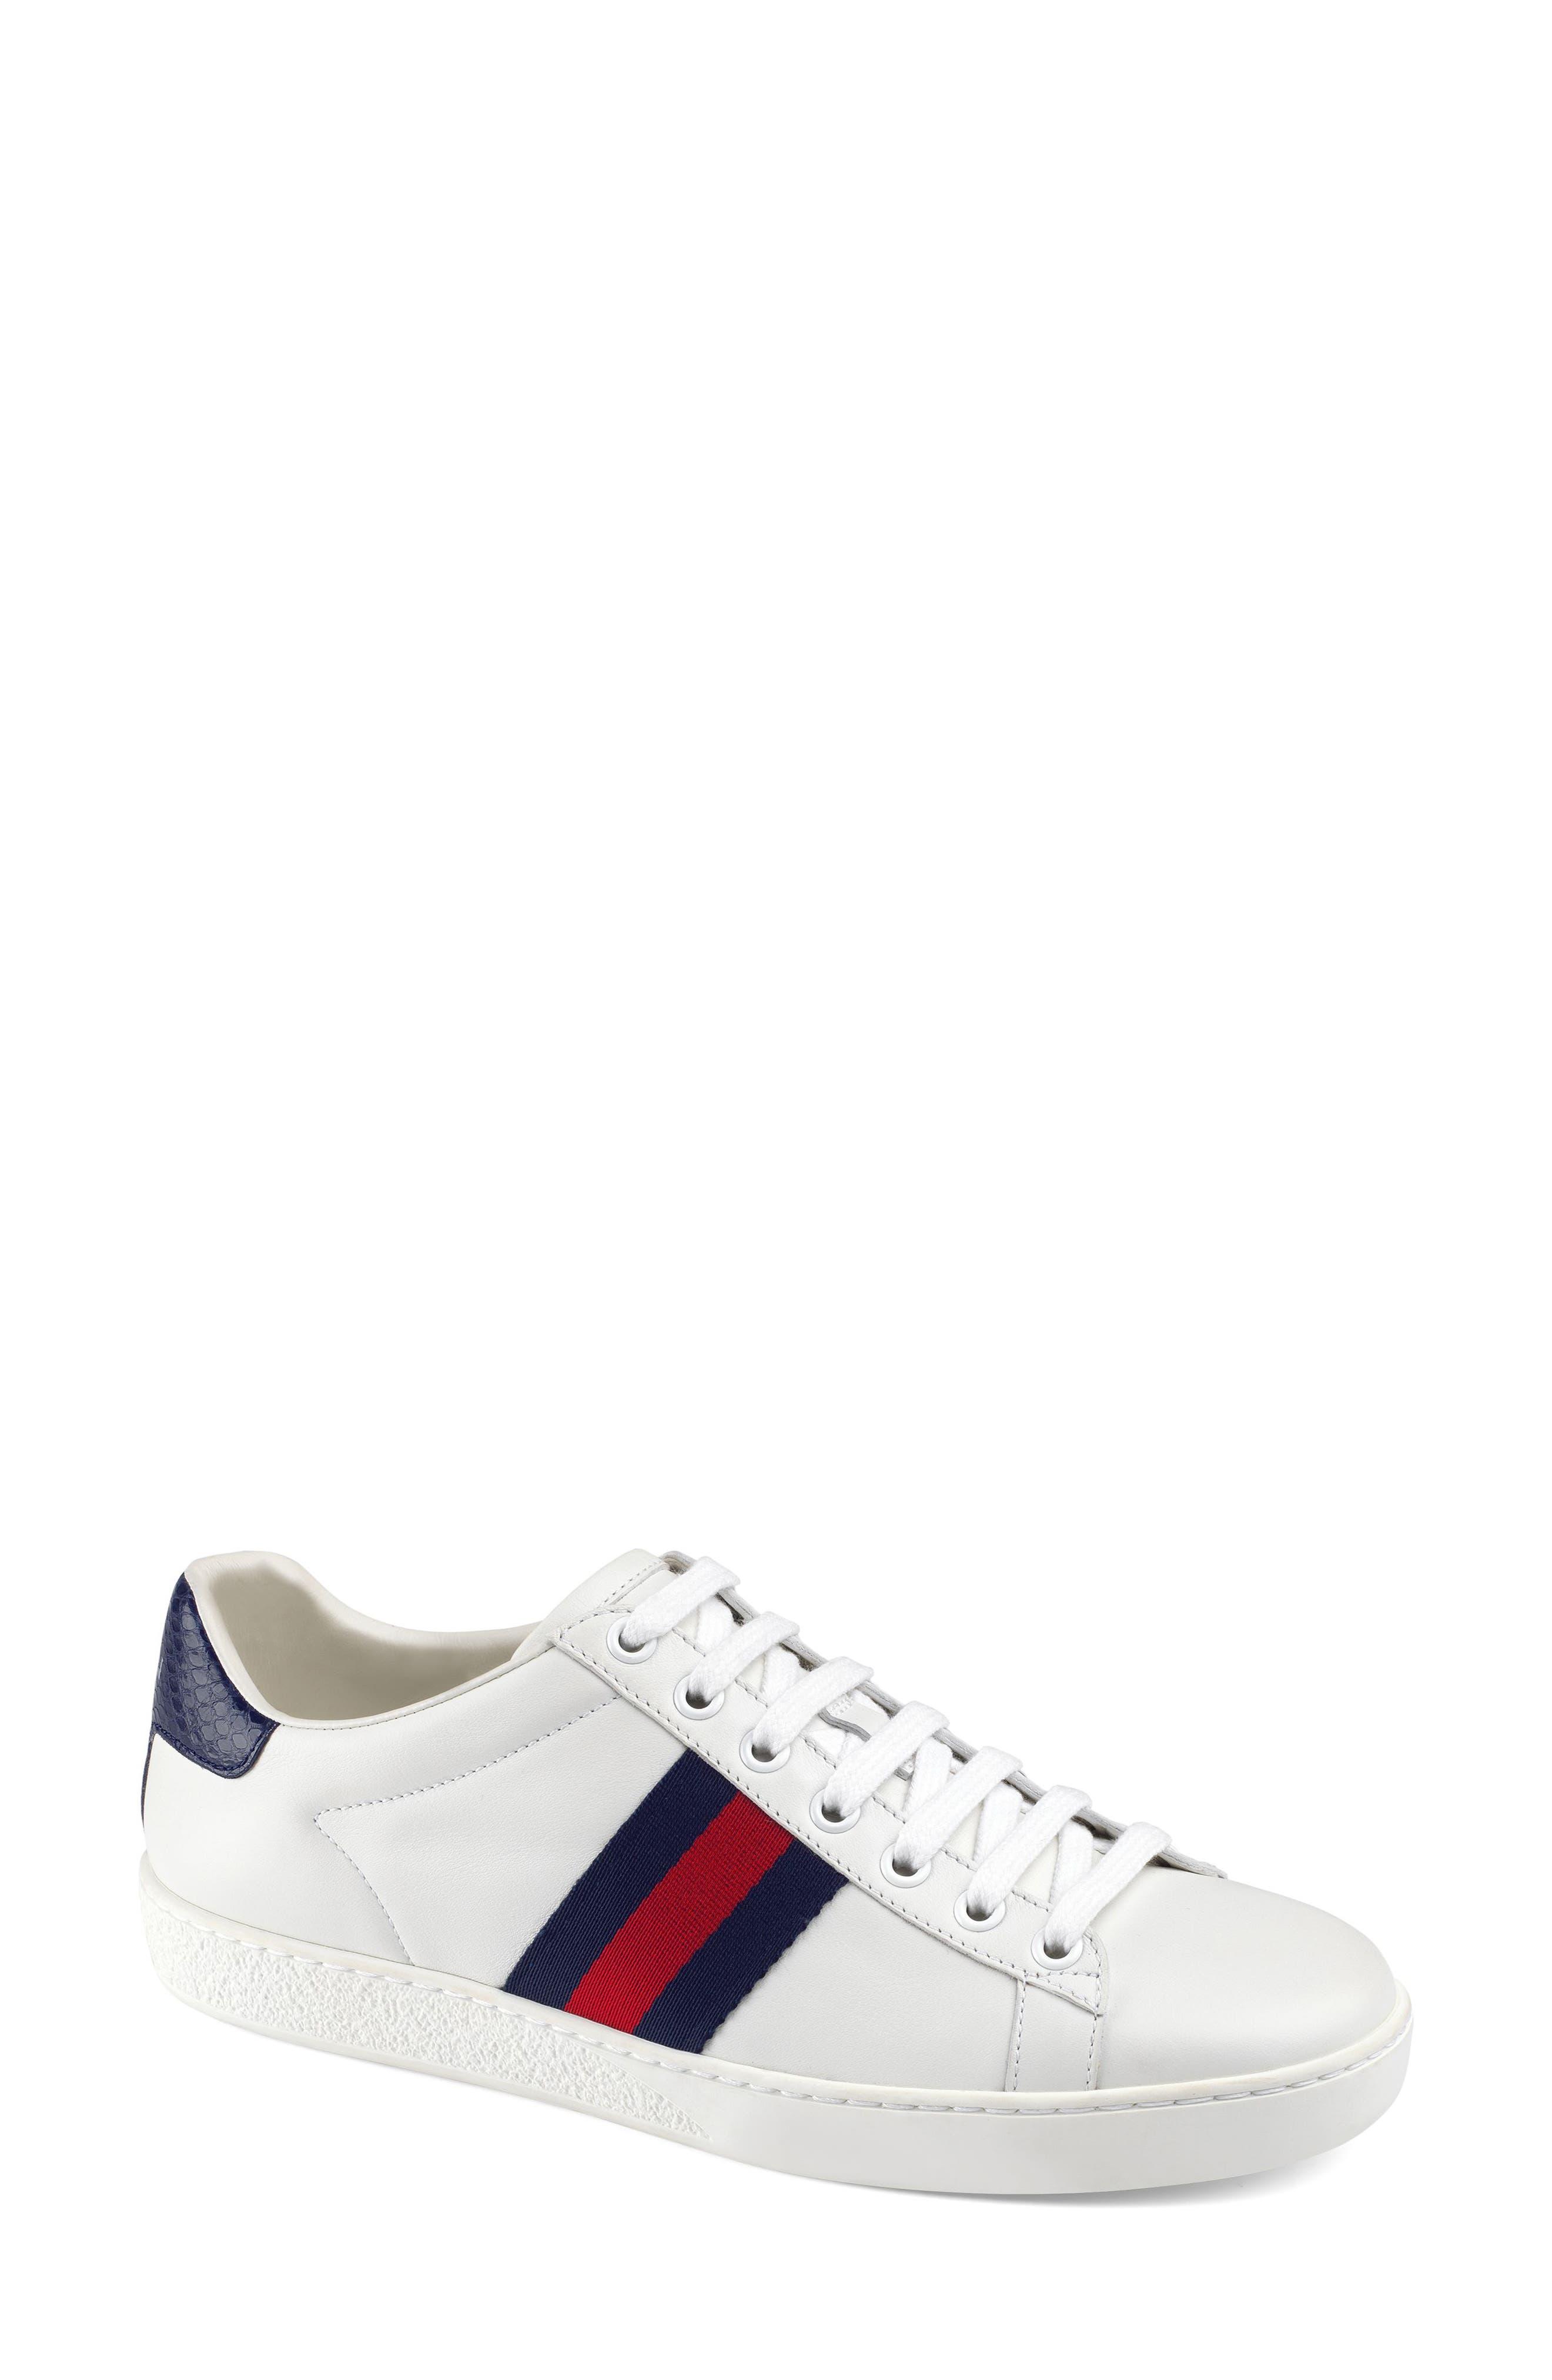 GUCCI 'New Ace' Sneaker, Main, color, 101